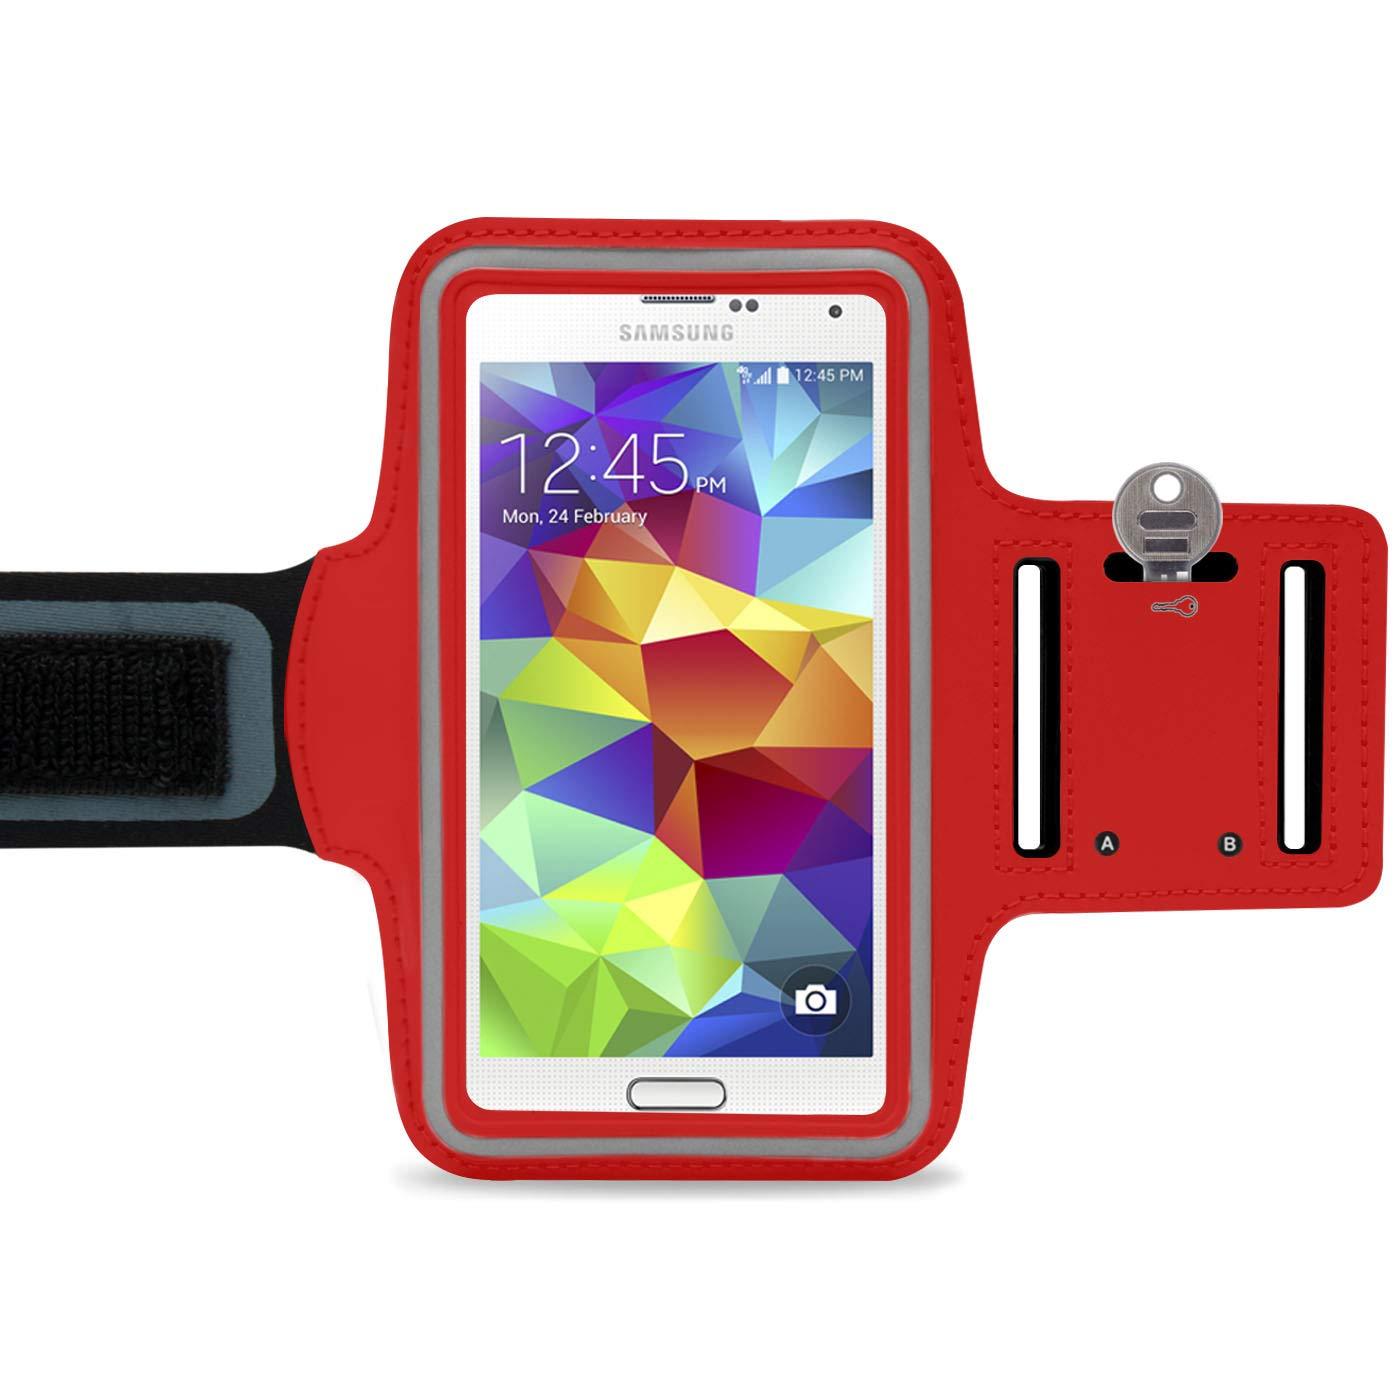 Neopren Sporth/ülle bis 5,7 Zoll F/ür HTC U11 // 10 Compact//One M9 Smartphone Sportarmband Zum Joggen Blau LetiStore Handy Sport Armband